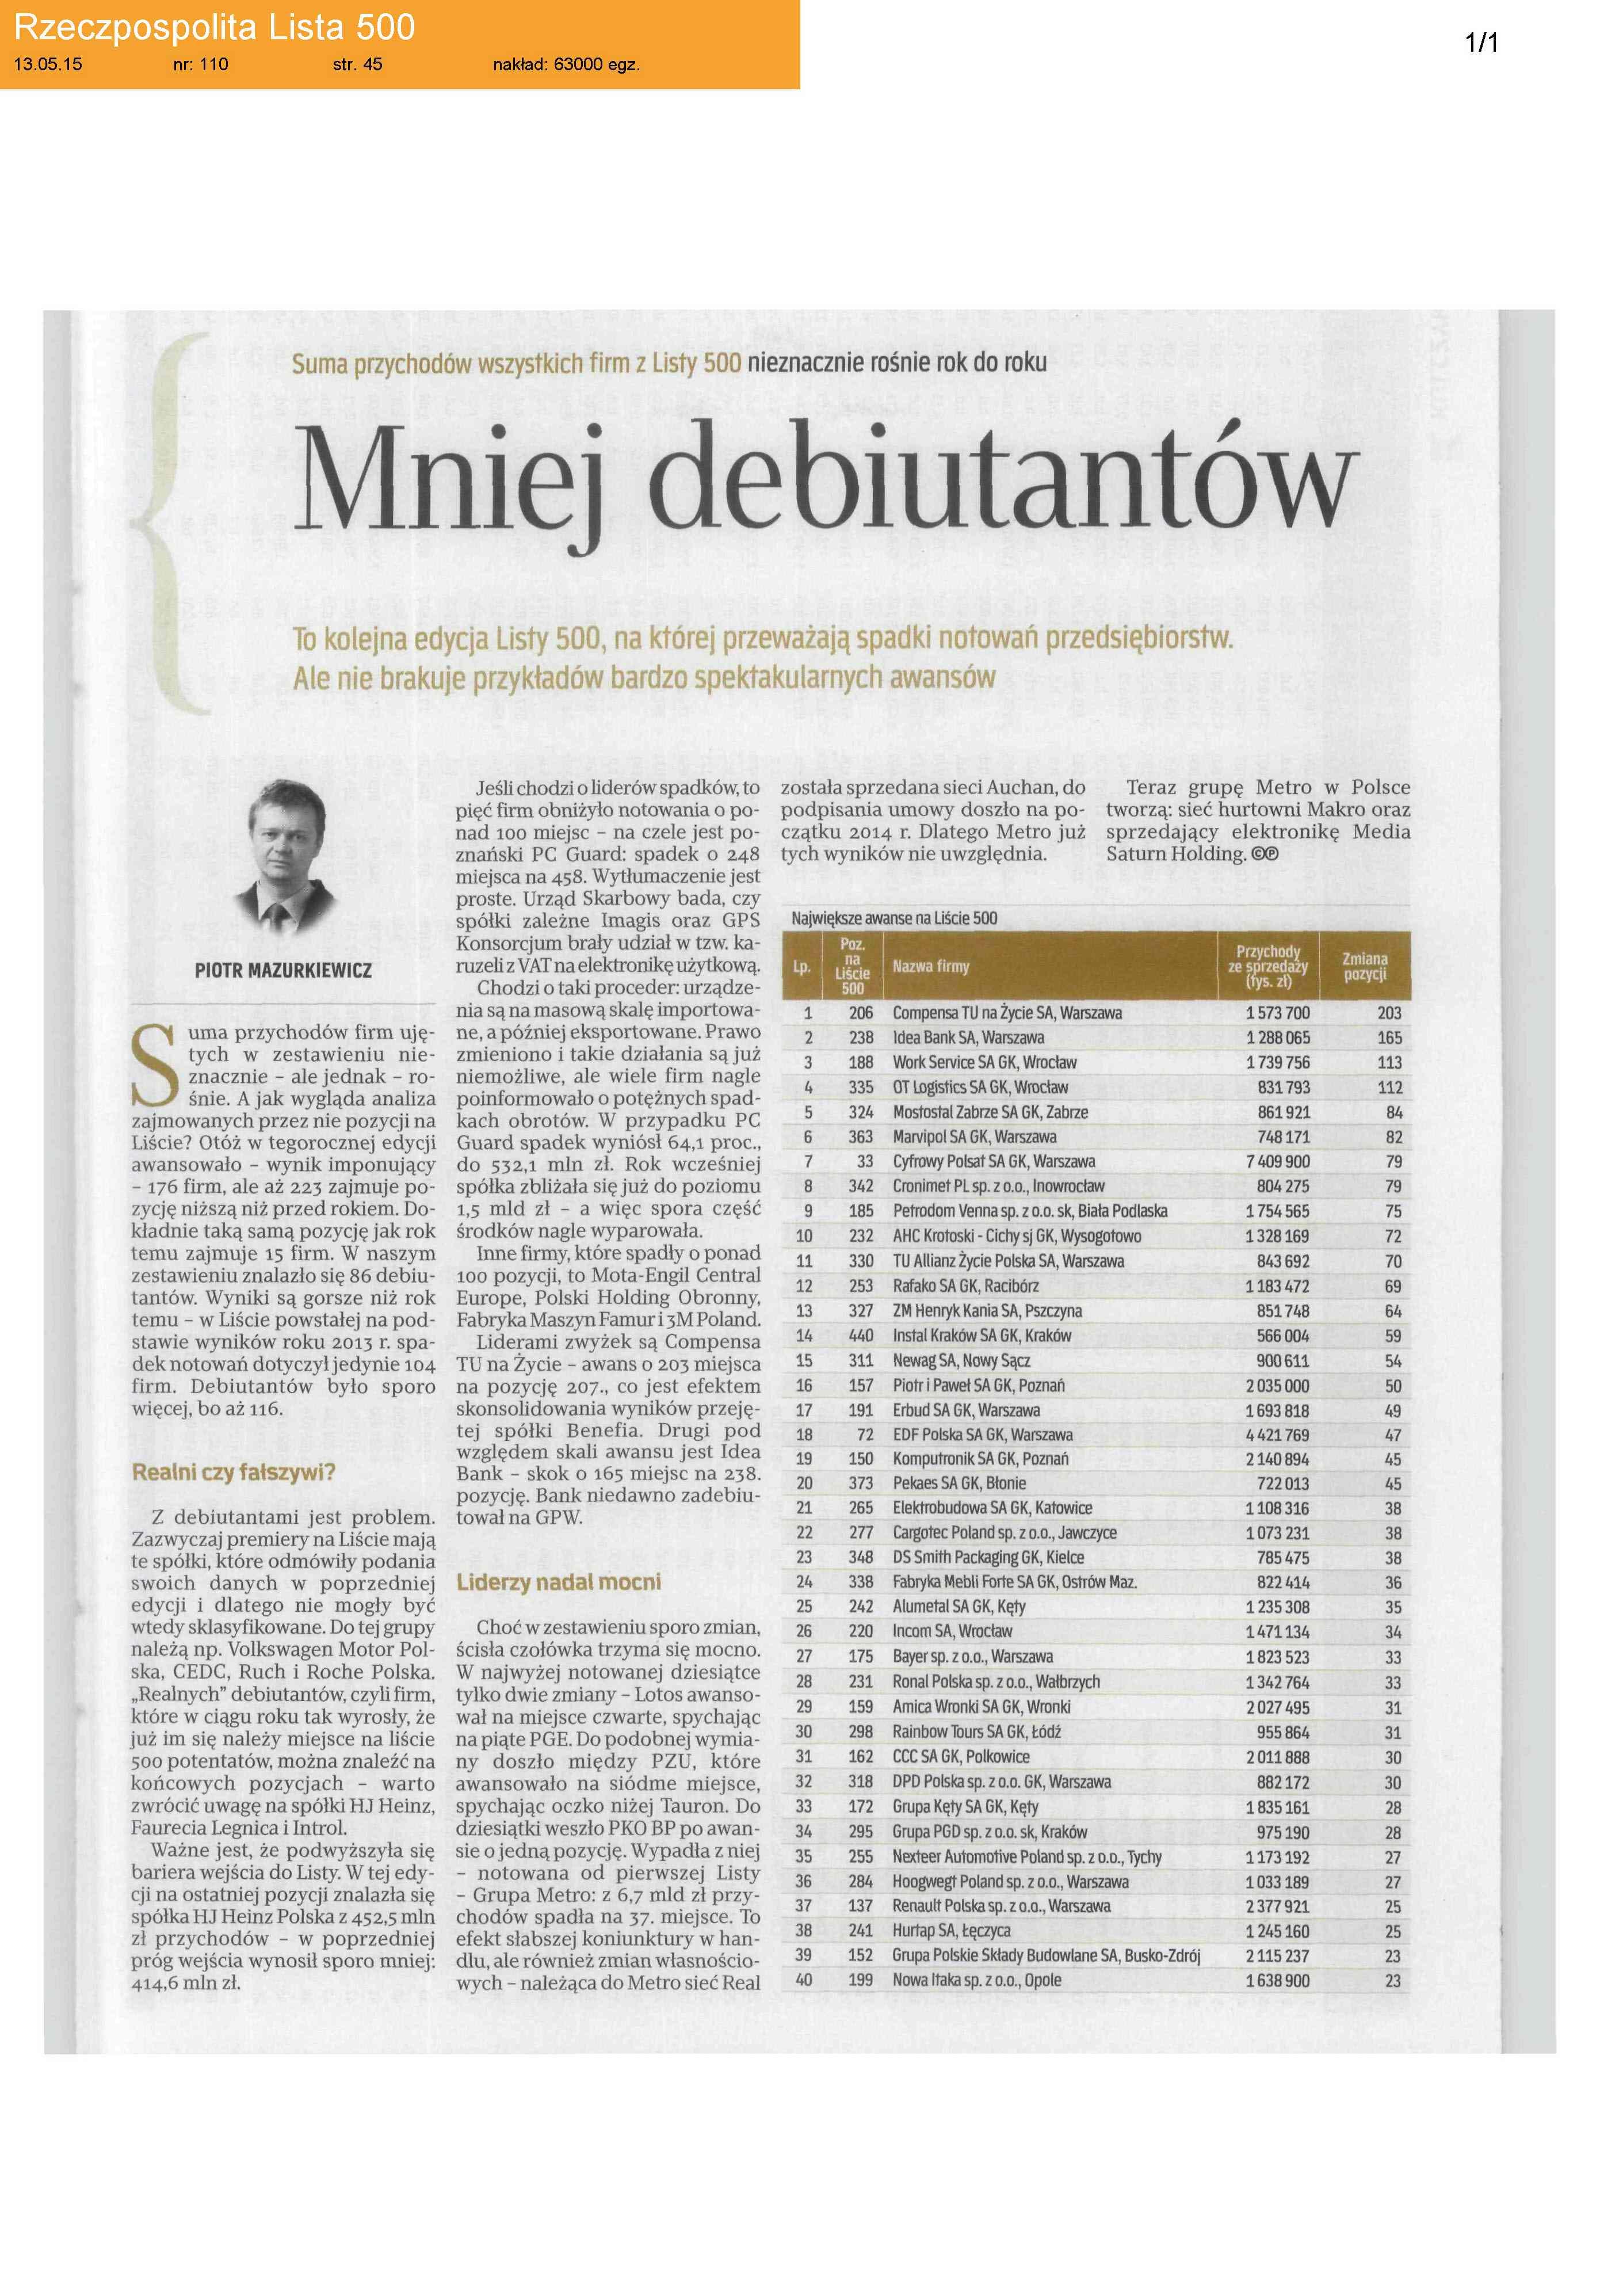 lista-500-firm-dziennika-rzeczpospolita